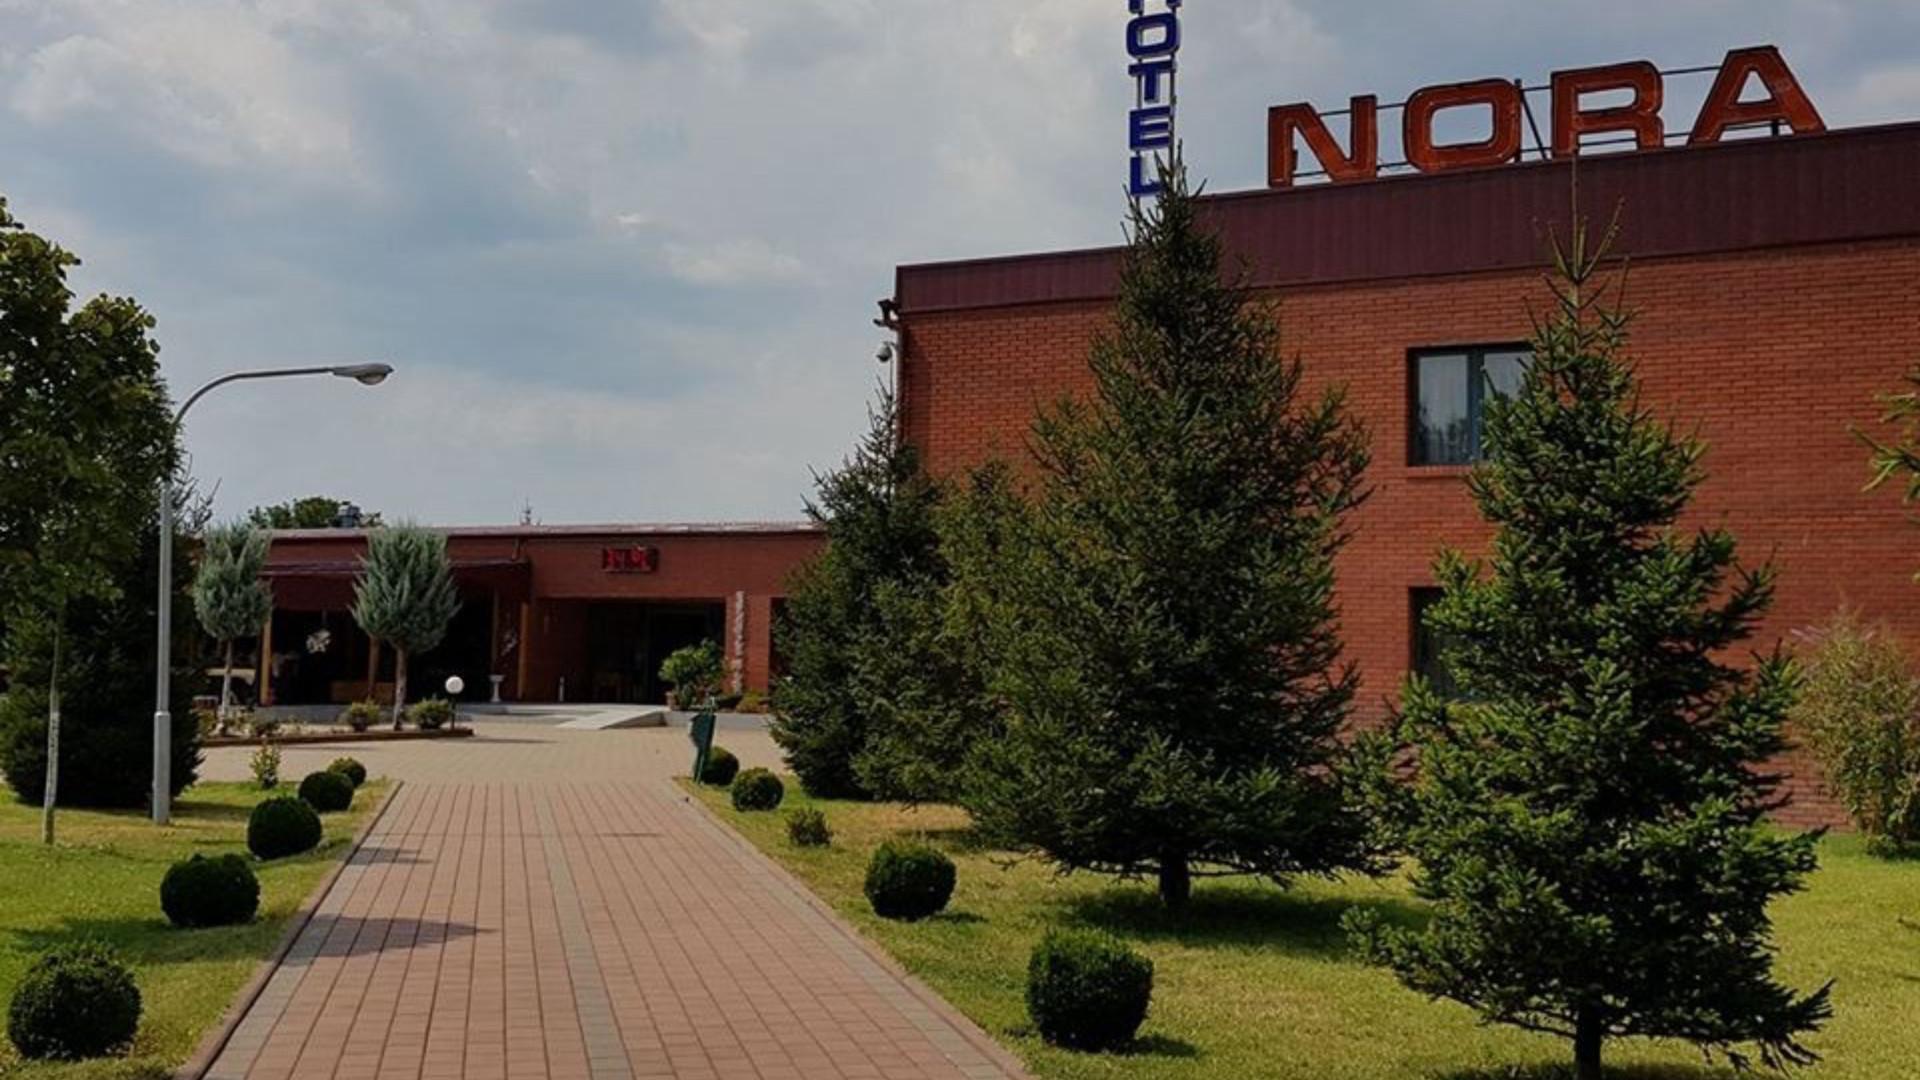 Hotel Nora